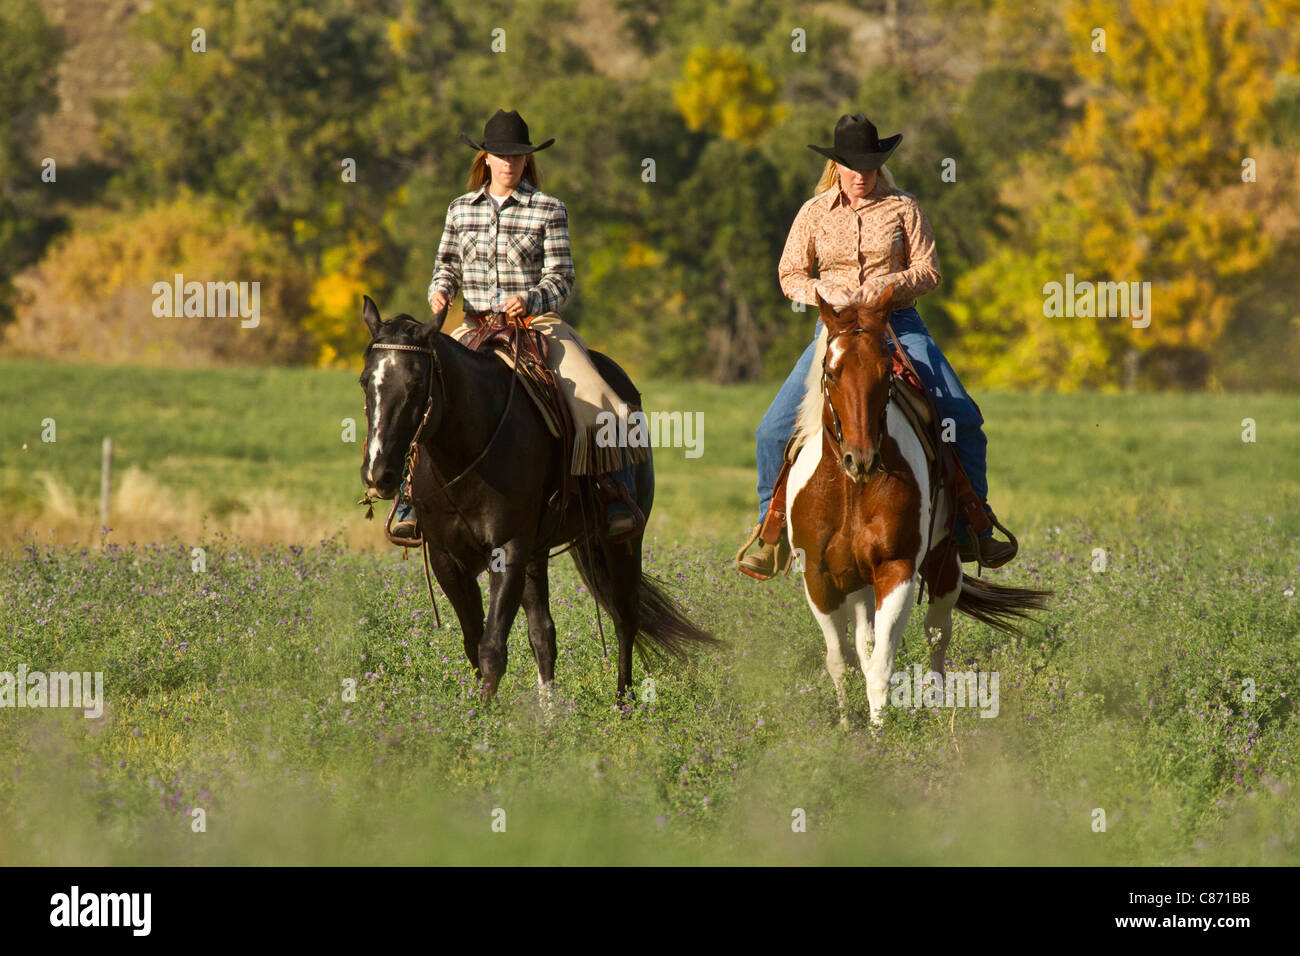 Two women ride across a meadow at dusk in south Dakota - Stock Image